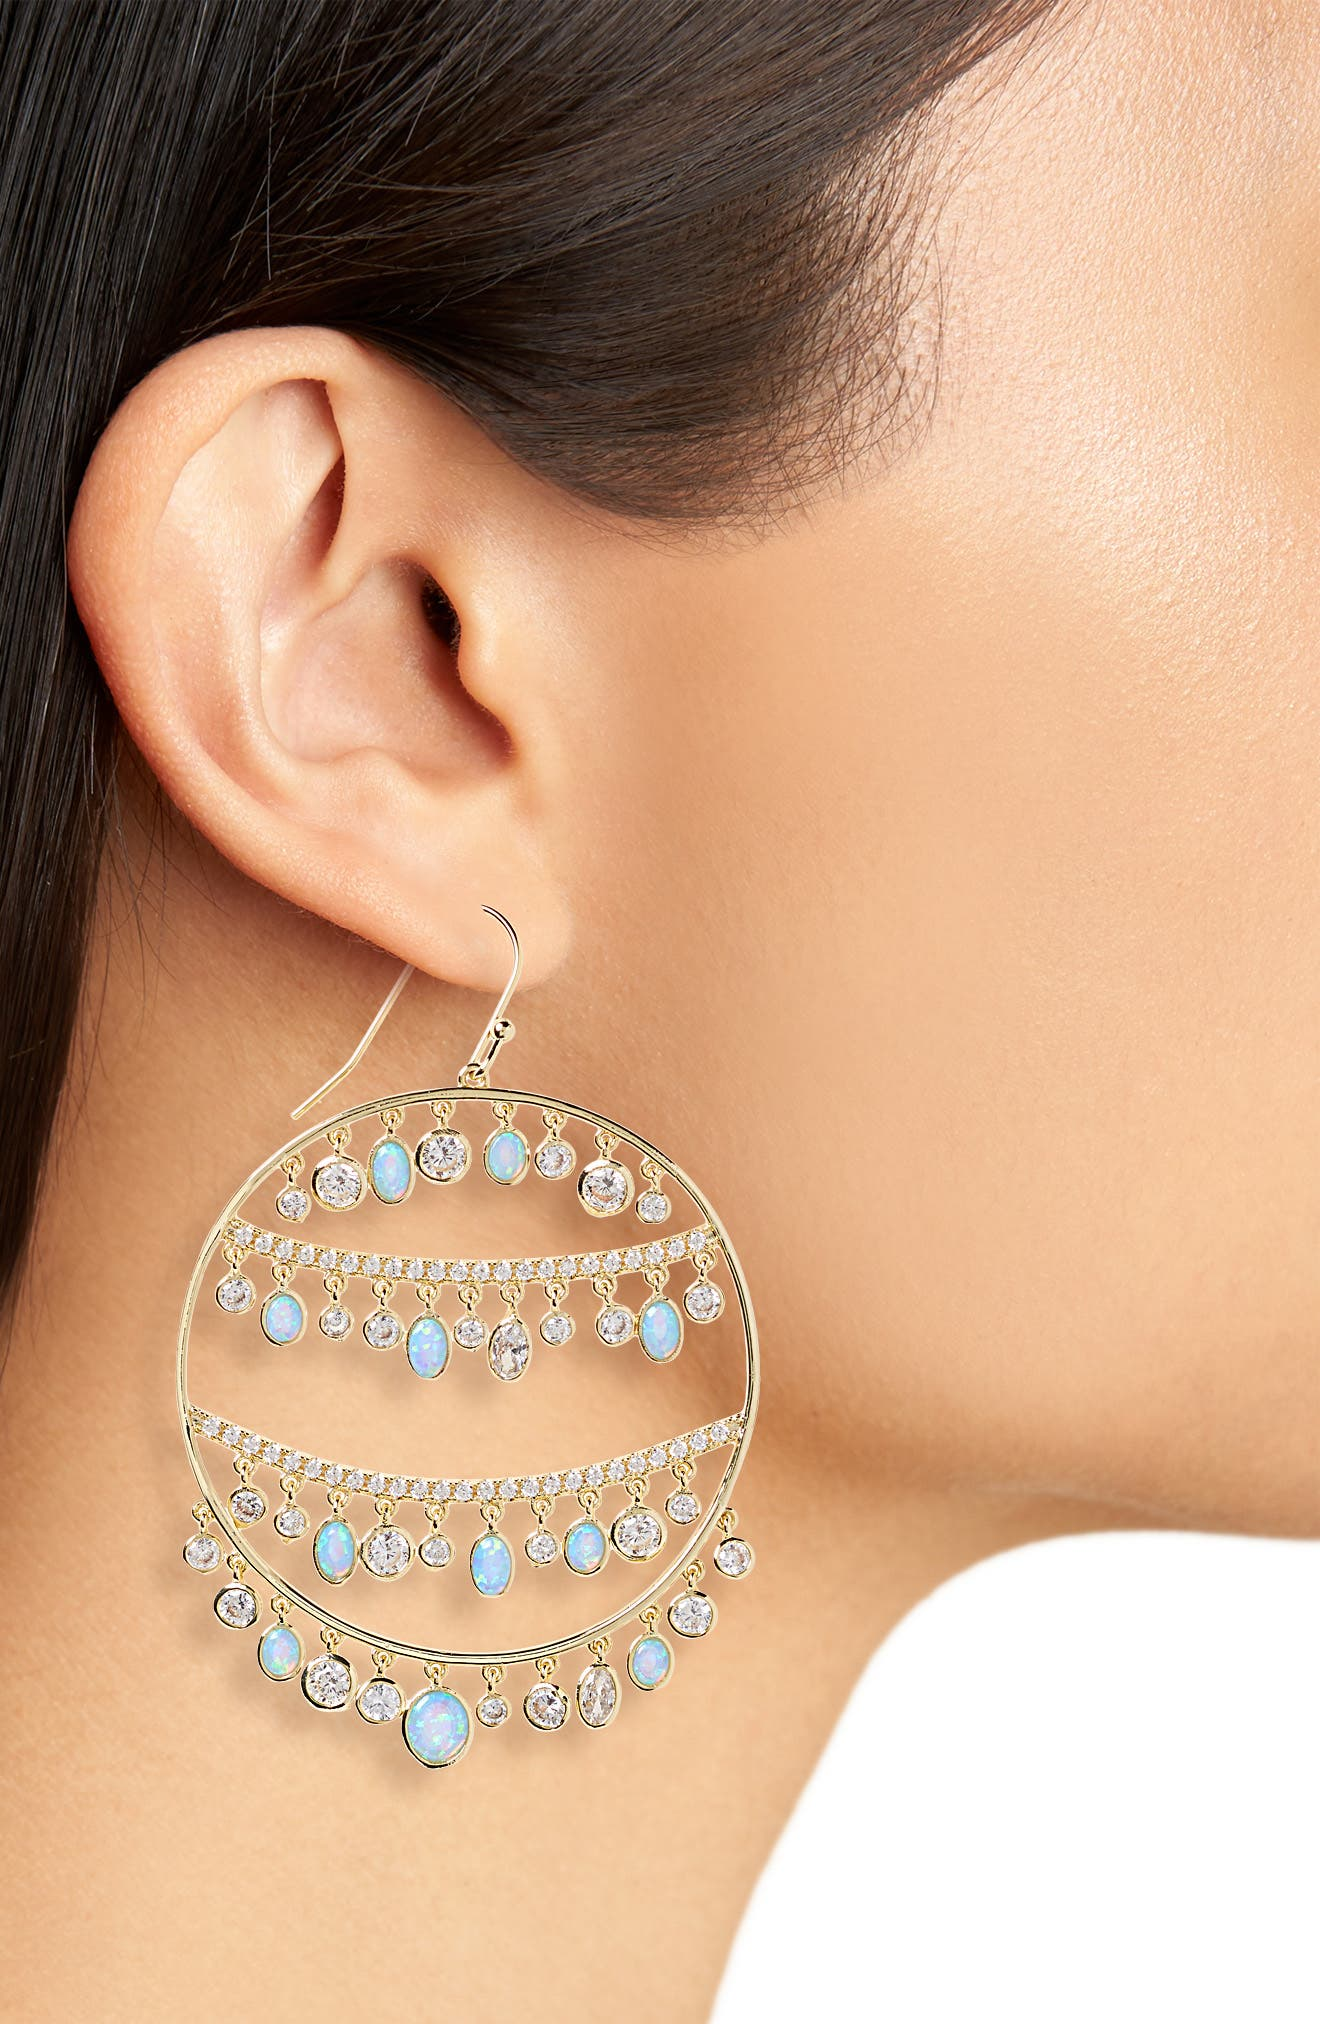 Fox Opal & Crystal Drop Earrings,                             Alternate thumbnail 2, color,                             Opal/ Crystal